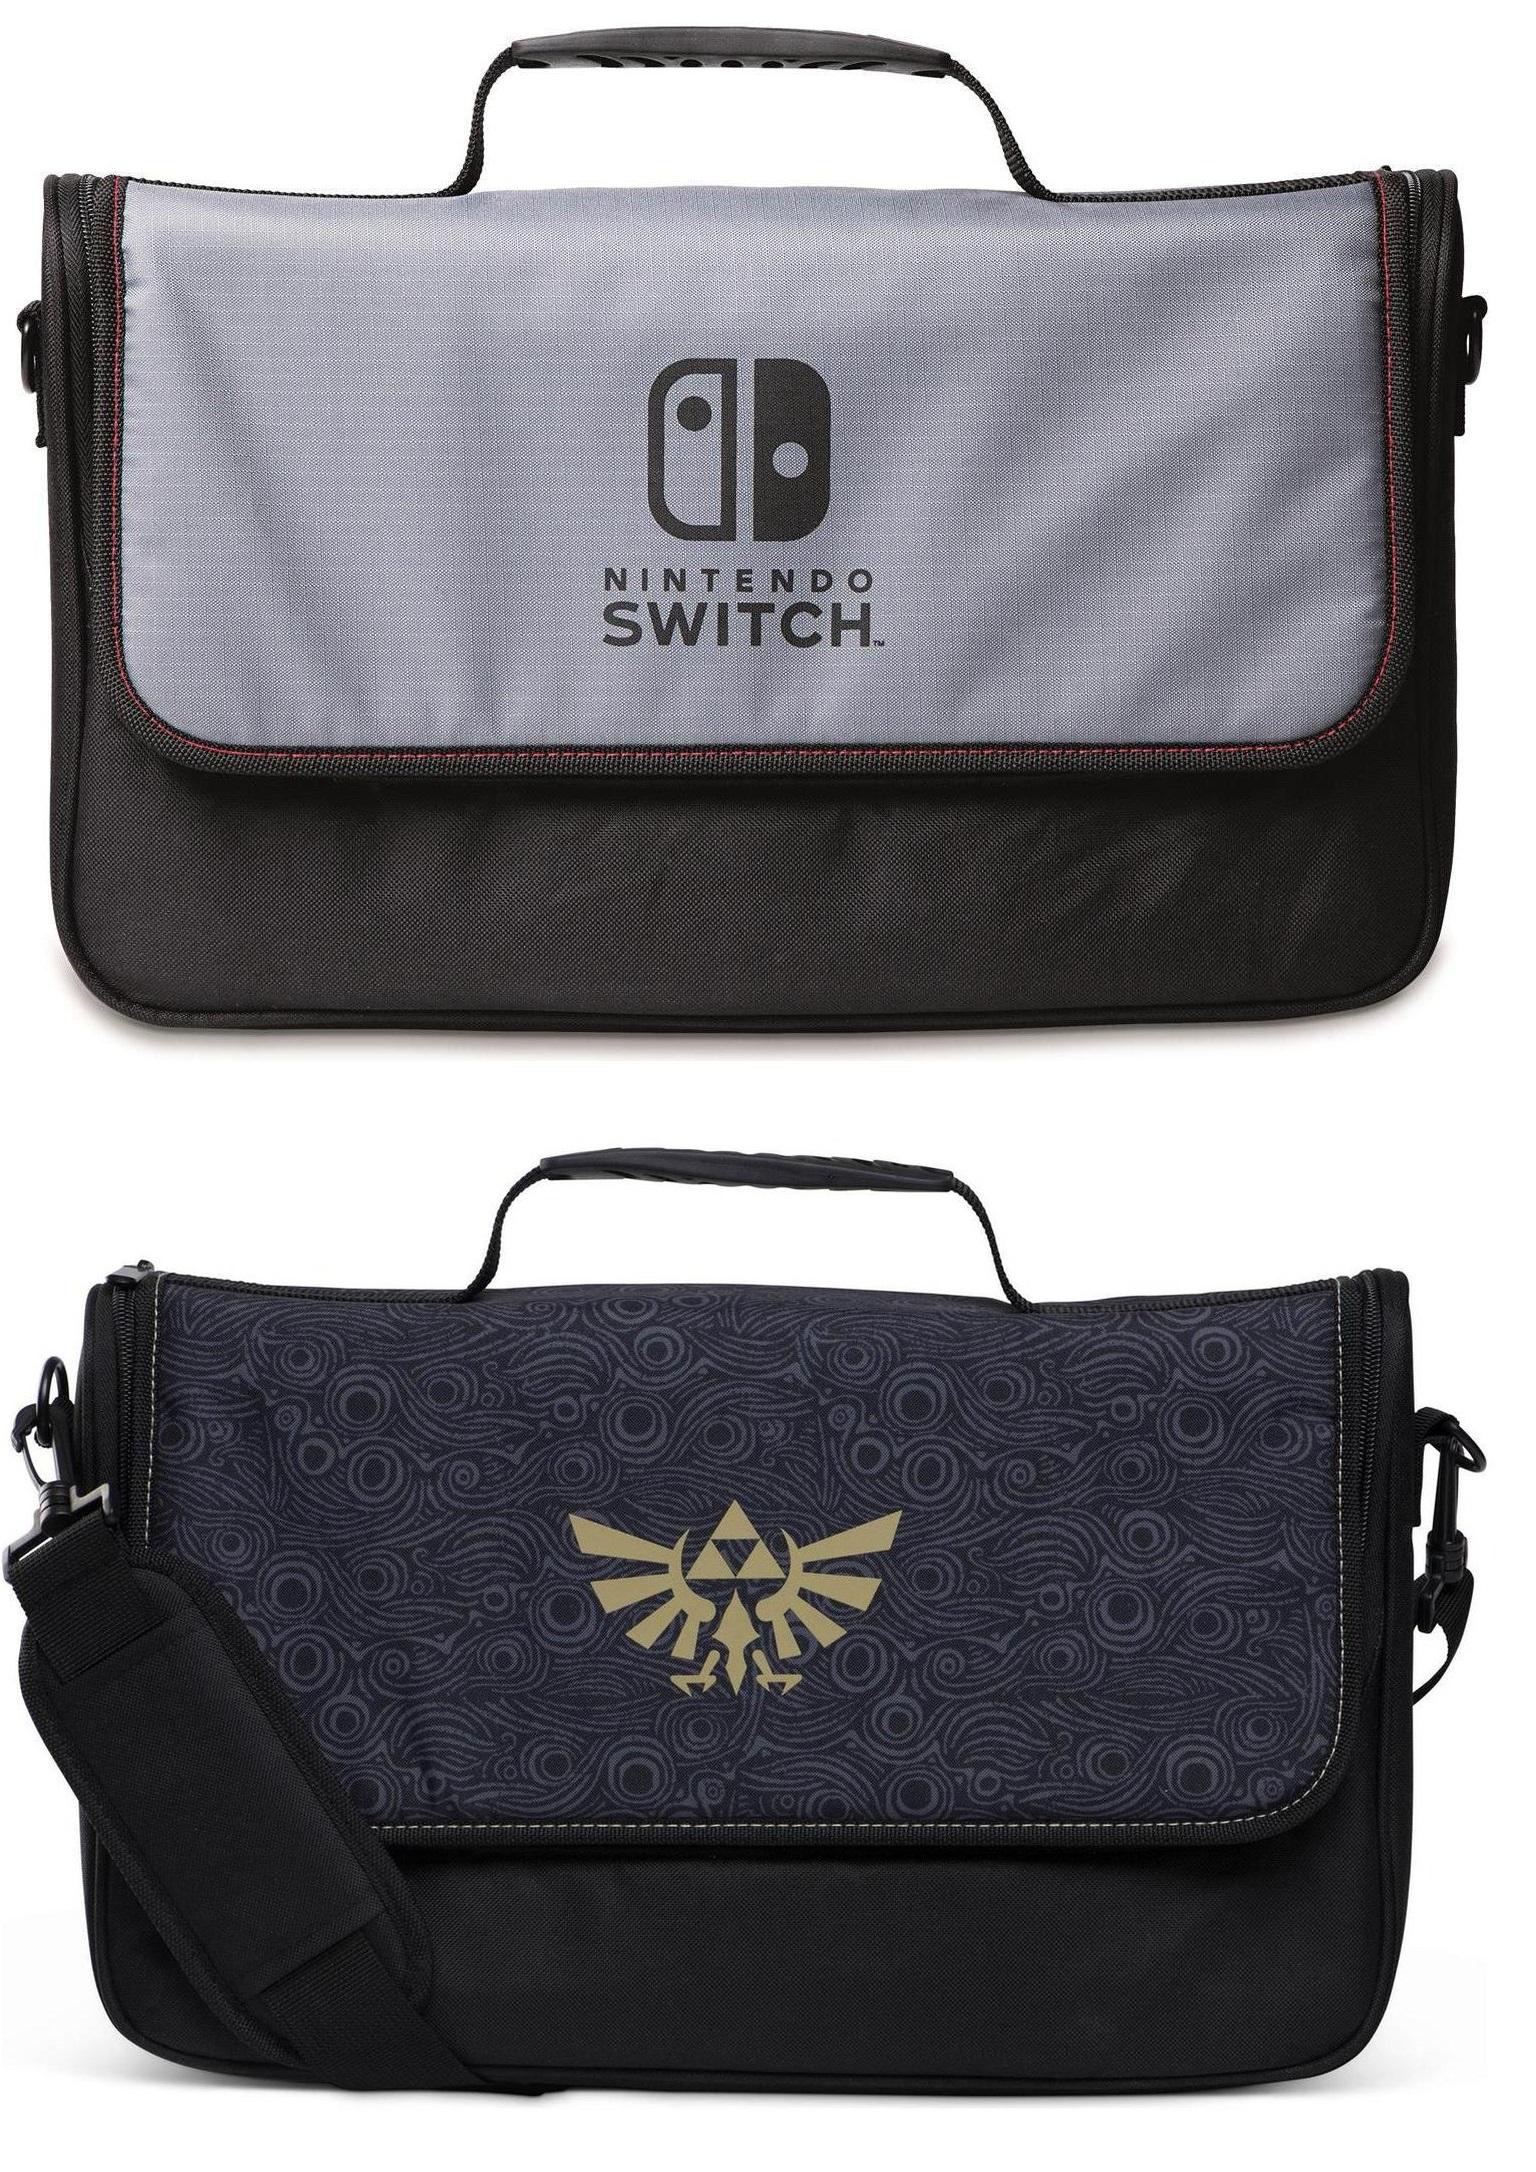 Everywhere Messenger Bag for Nintendo Switch or Legend of Zelda was £24.99  now £17.99 Free C C   Argos   Argos eBay eebcf4340b978